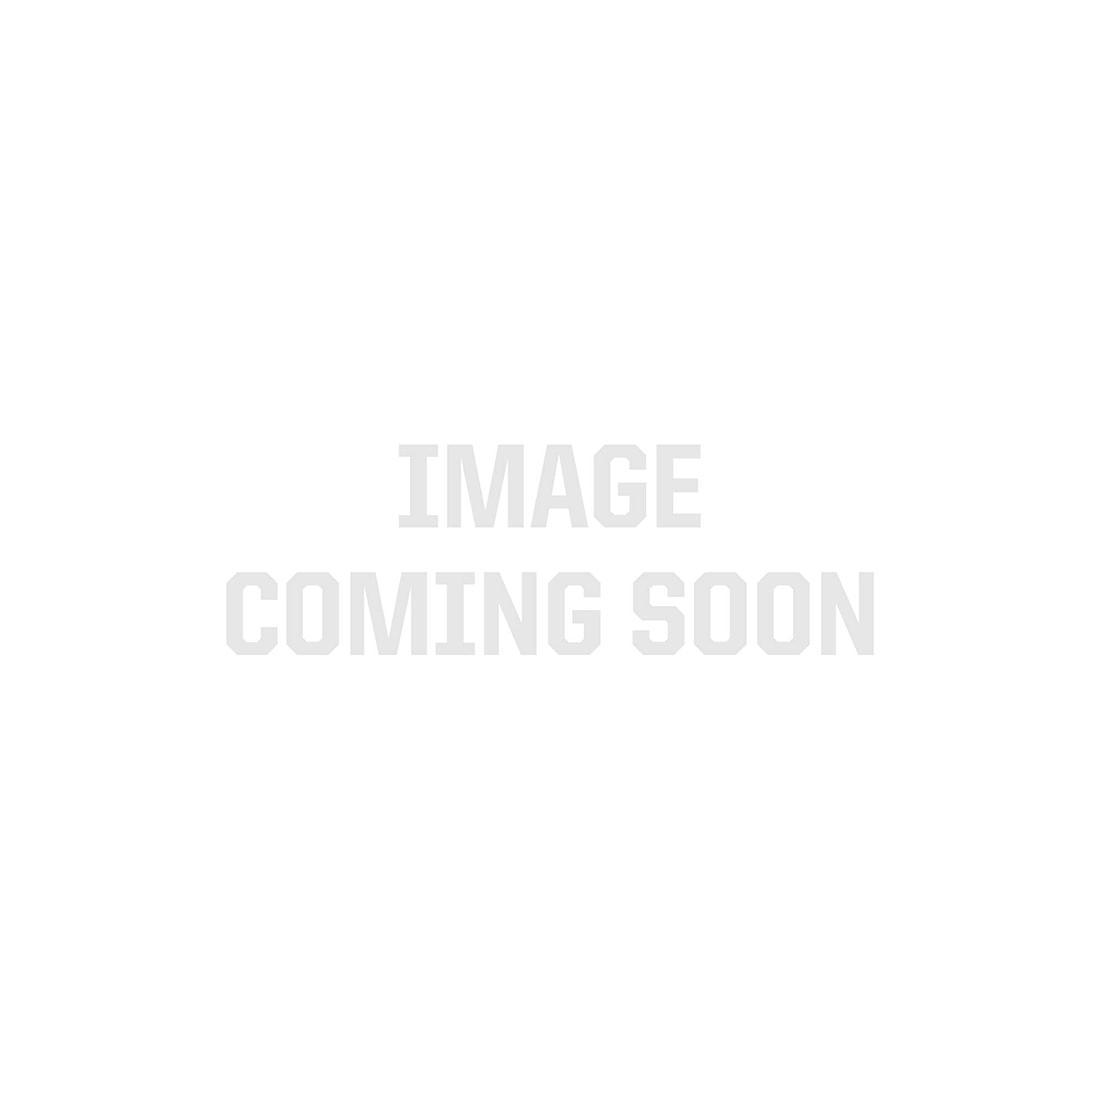 Universal Dimming Driver - 12 VDC - 3x60W